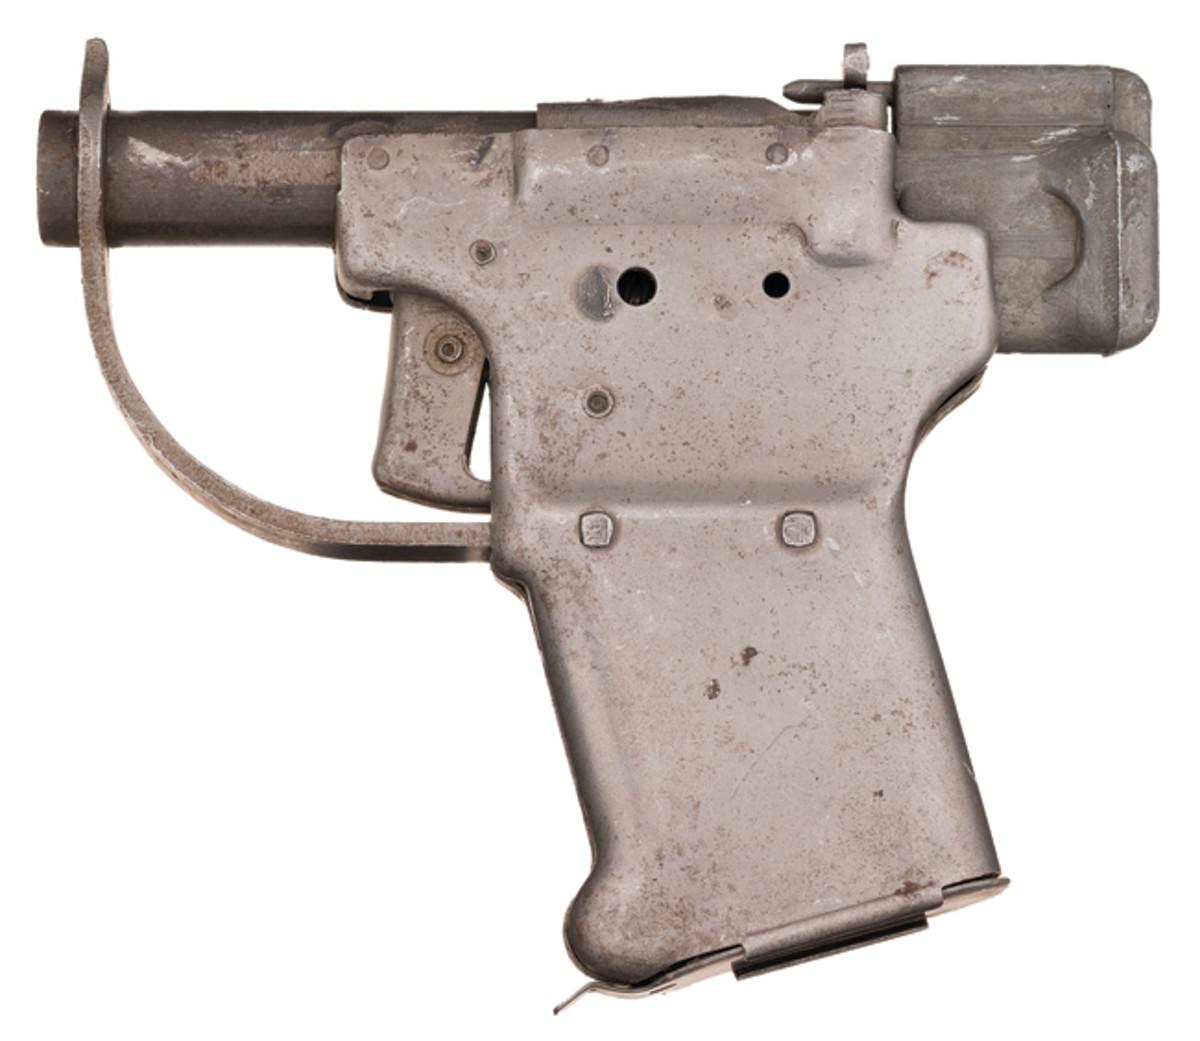 U.S. General Motors FP-45 Liberator Single Shot Pistol